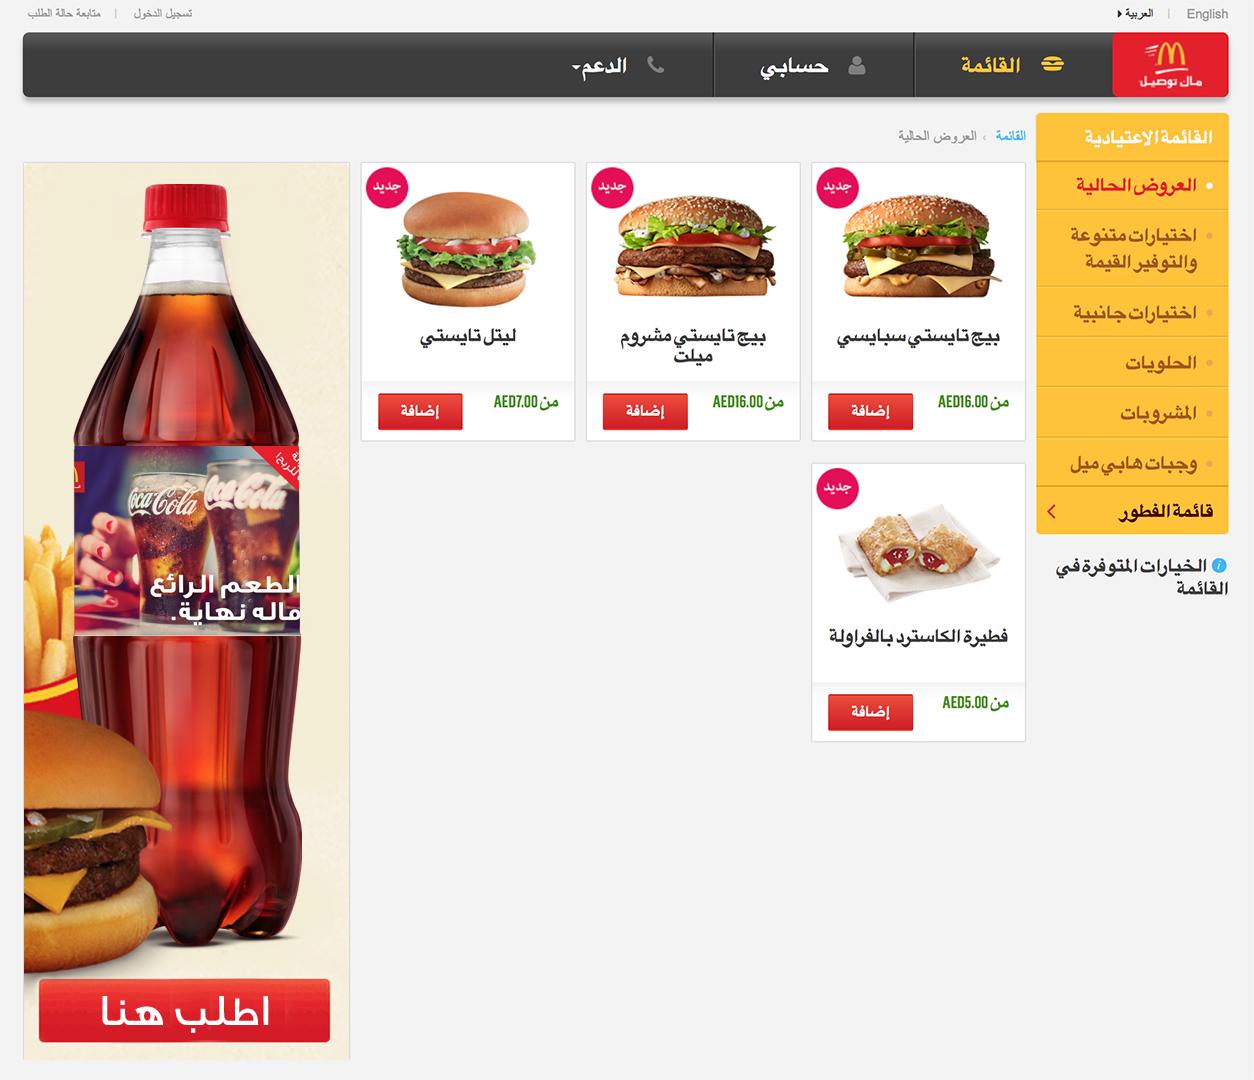 web_UAE_ARAB.jpg